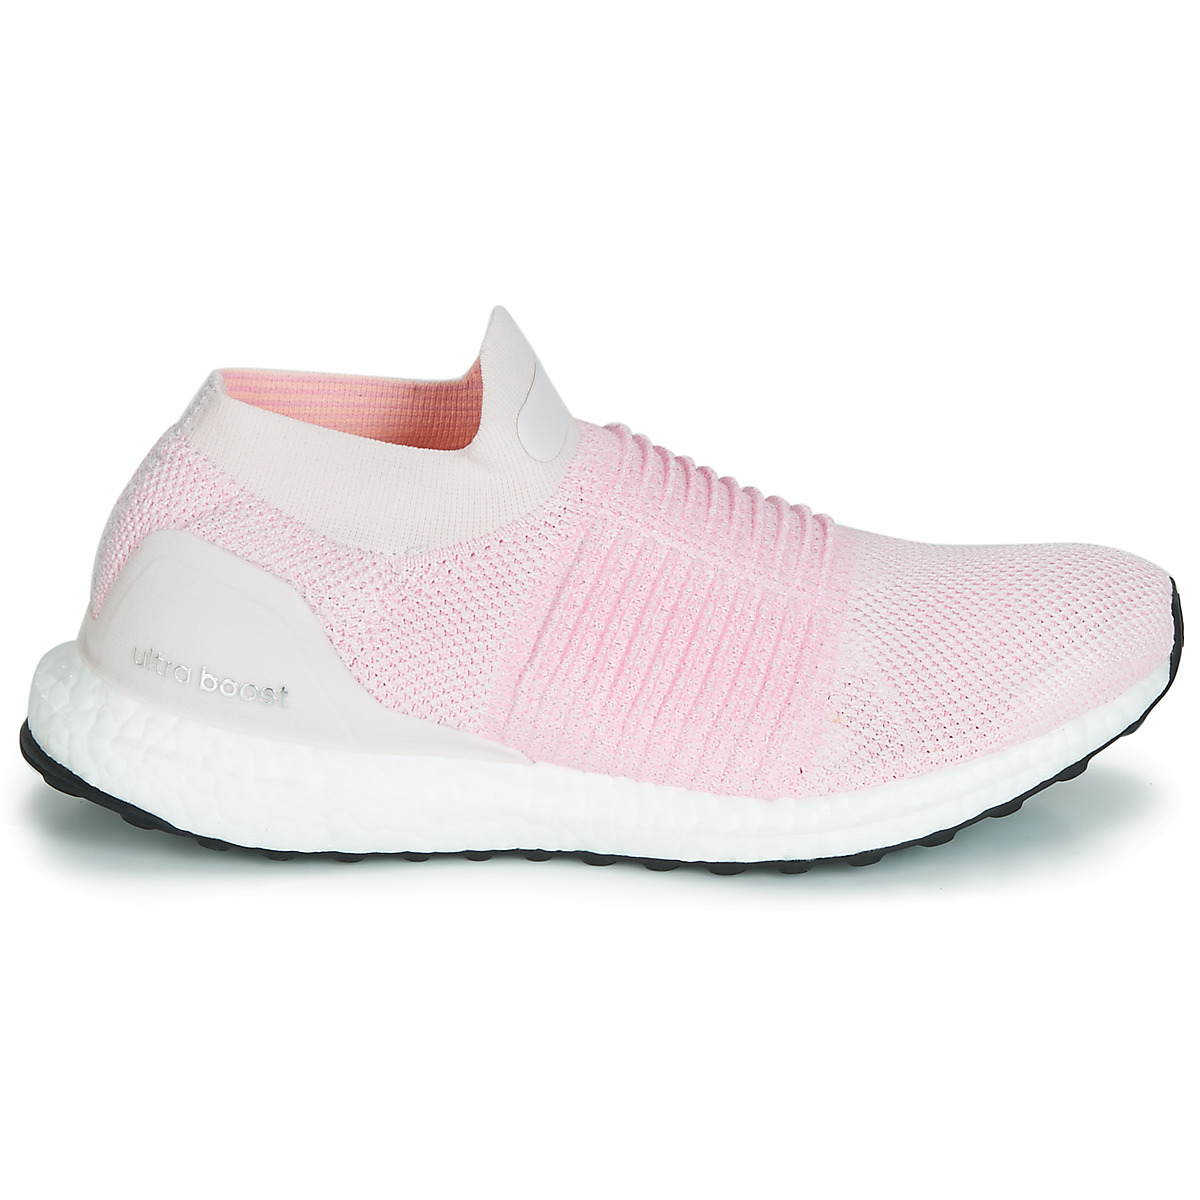 scarpe donna adidas ultraboost